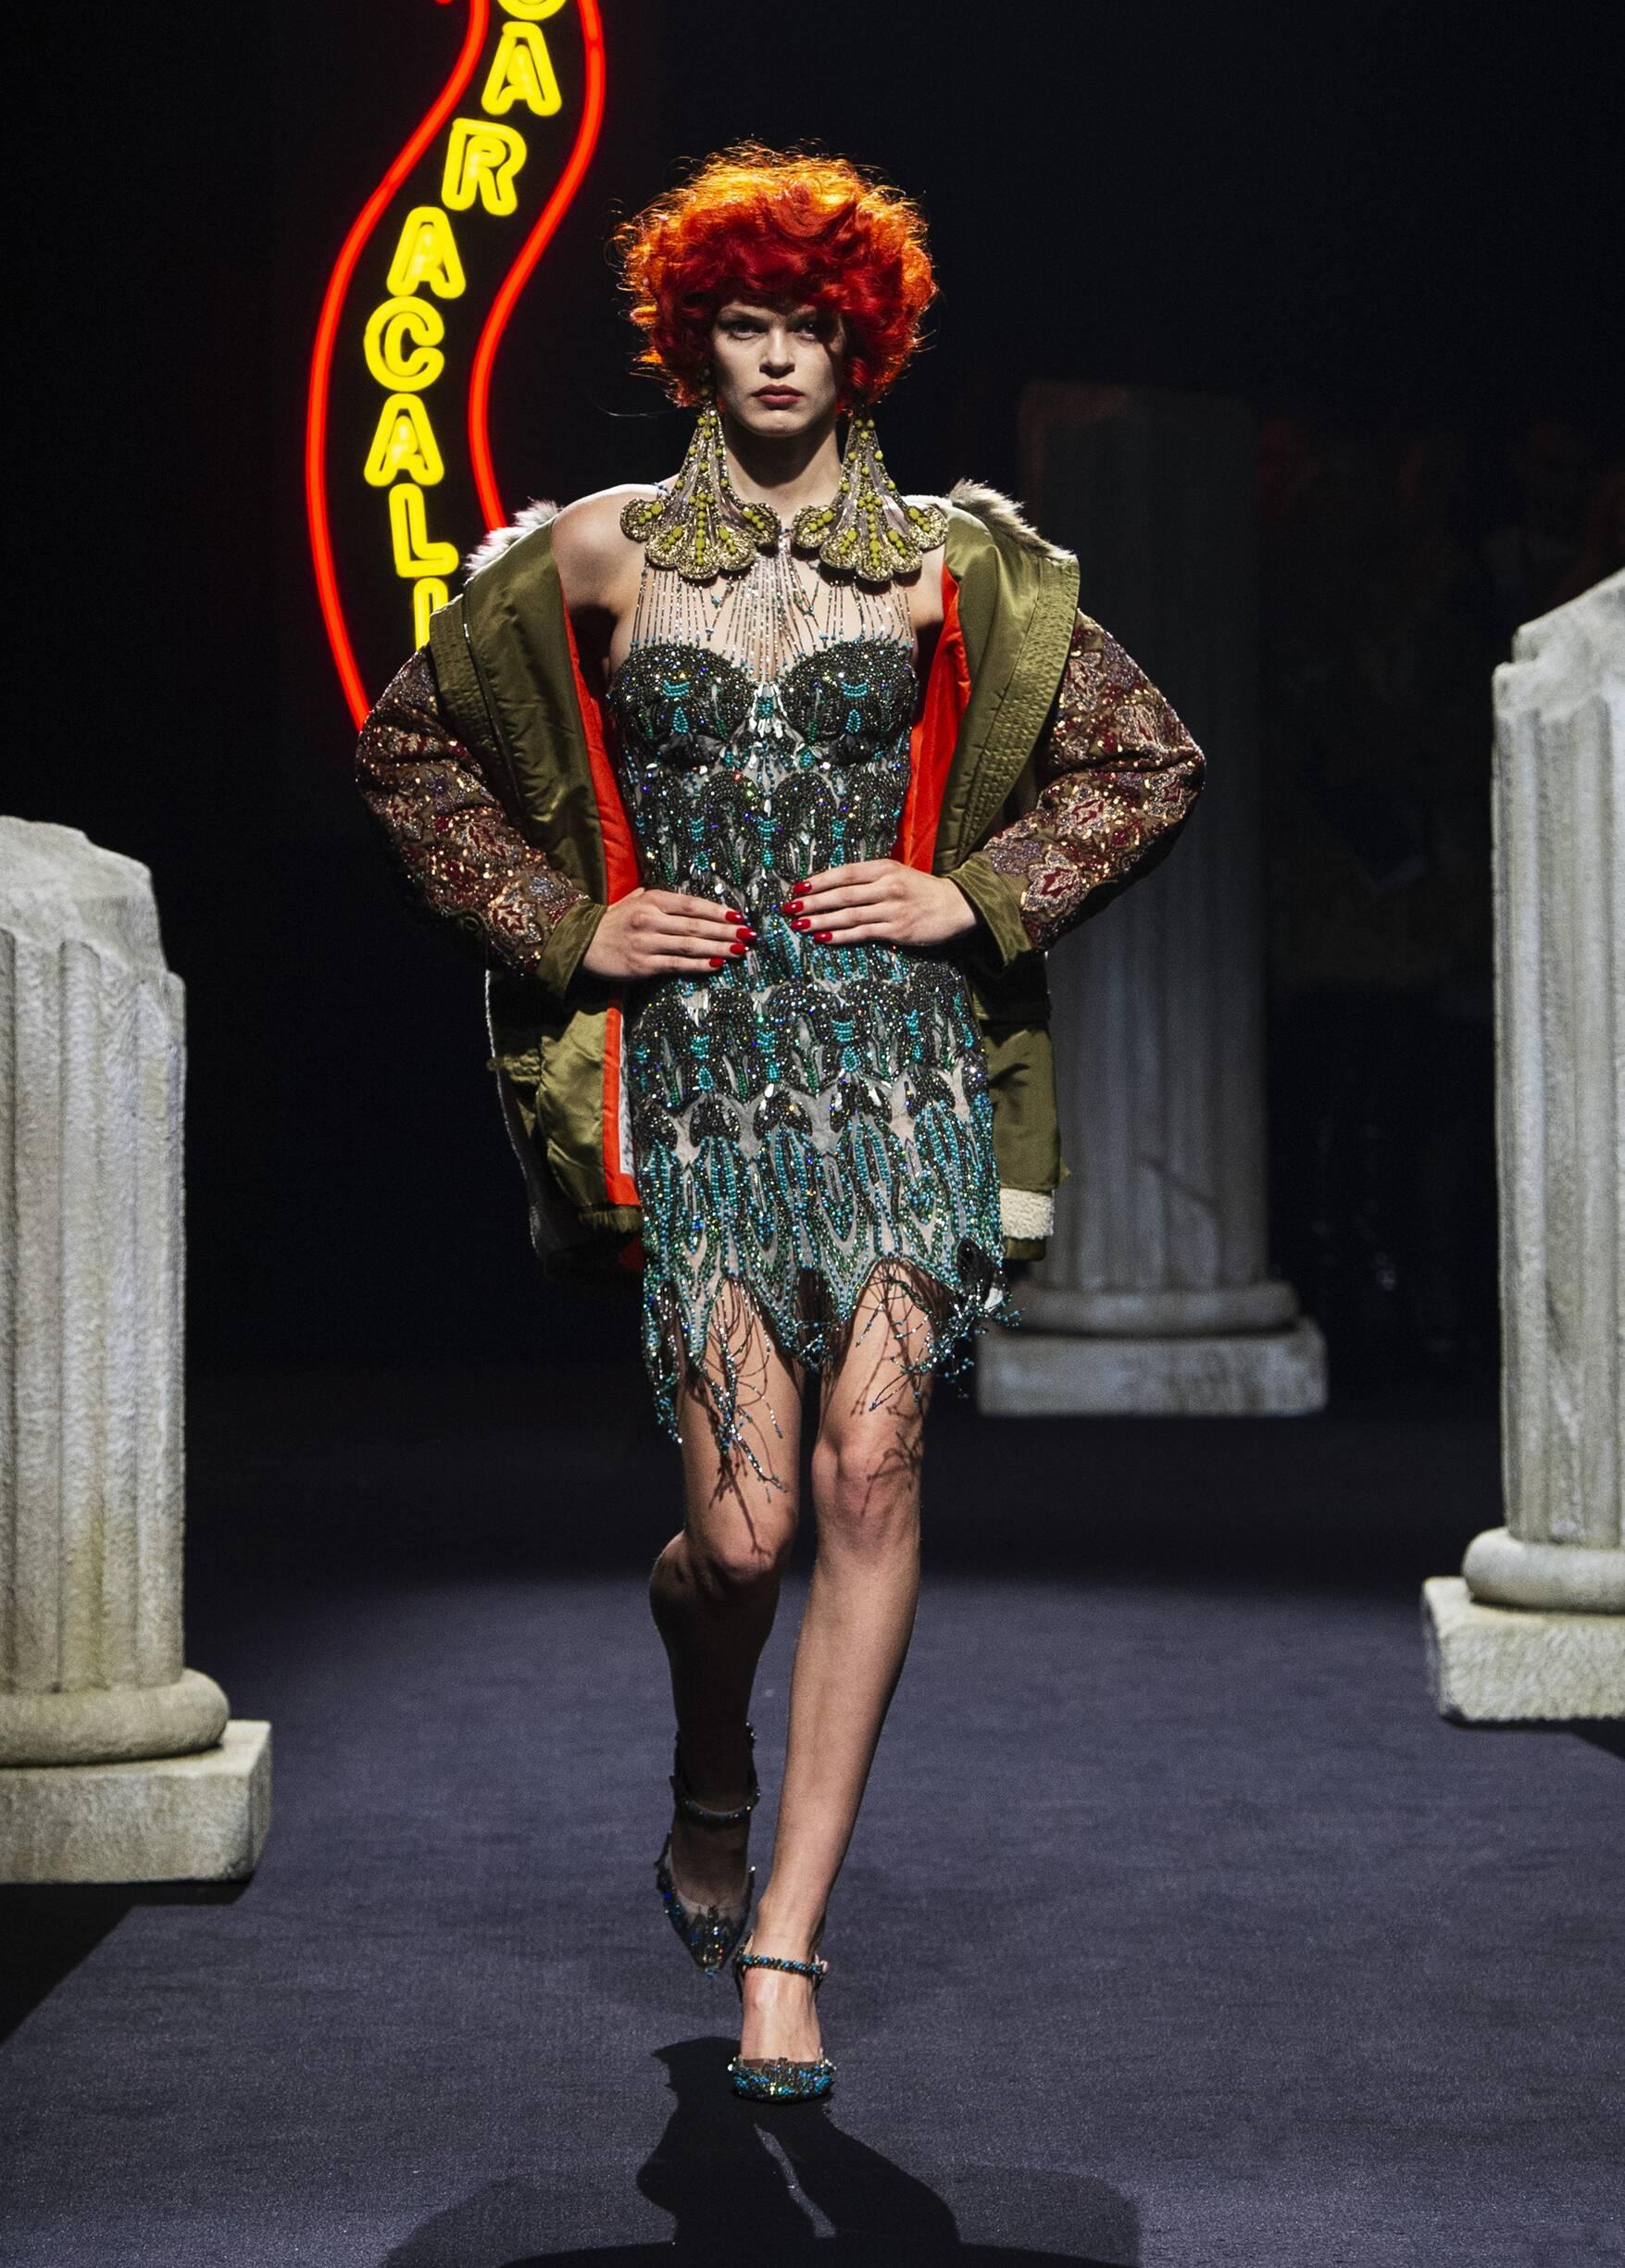 2019 Catwalk Moschino Woman Fashion Show Winter